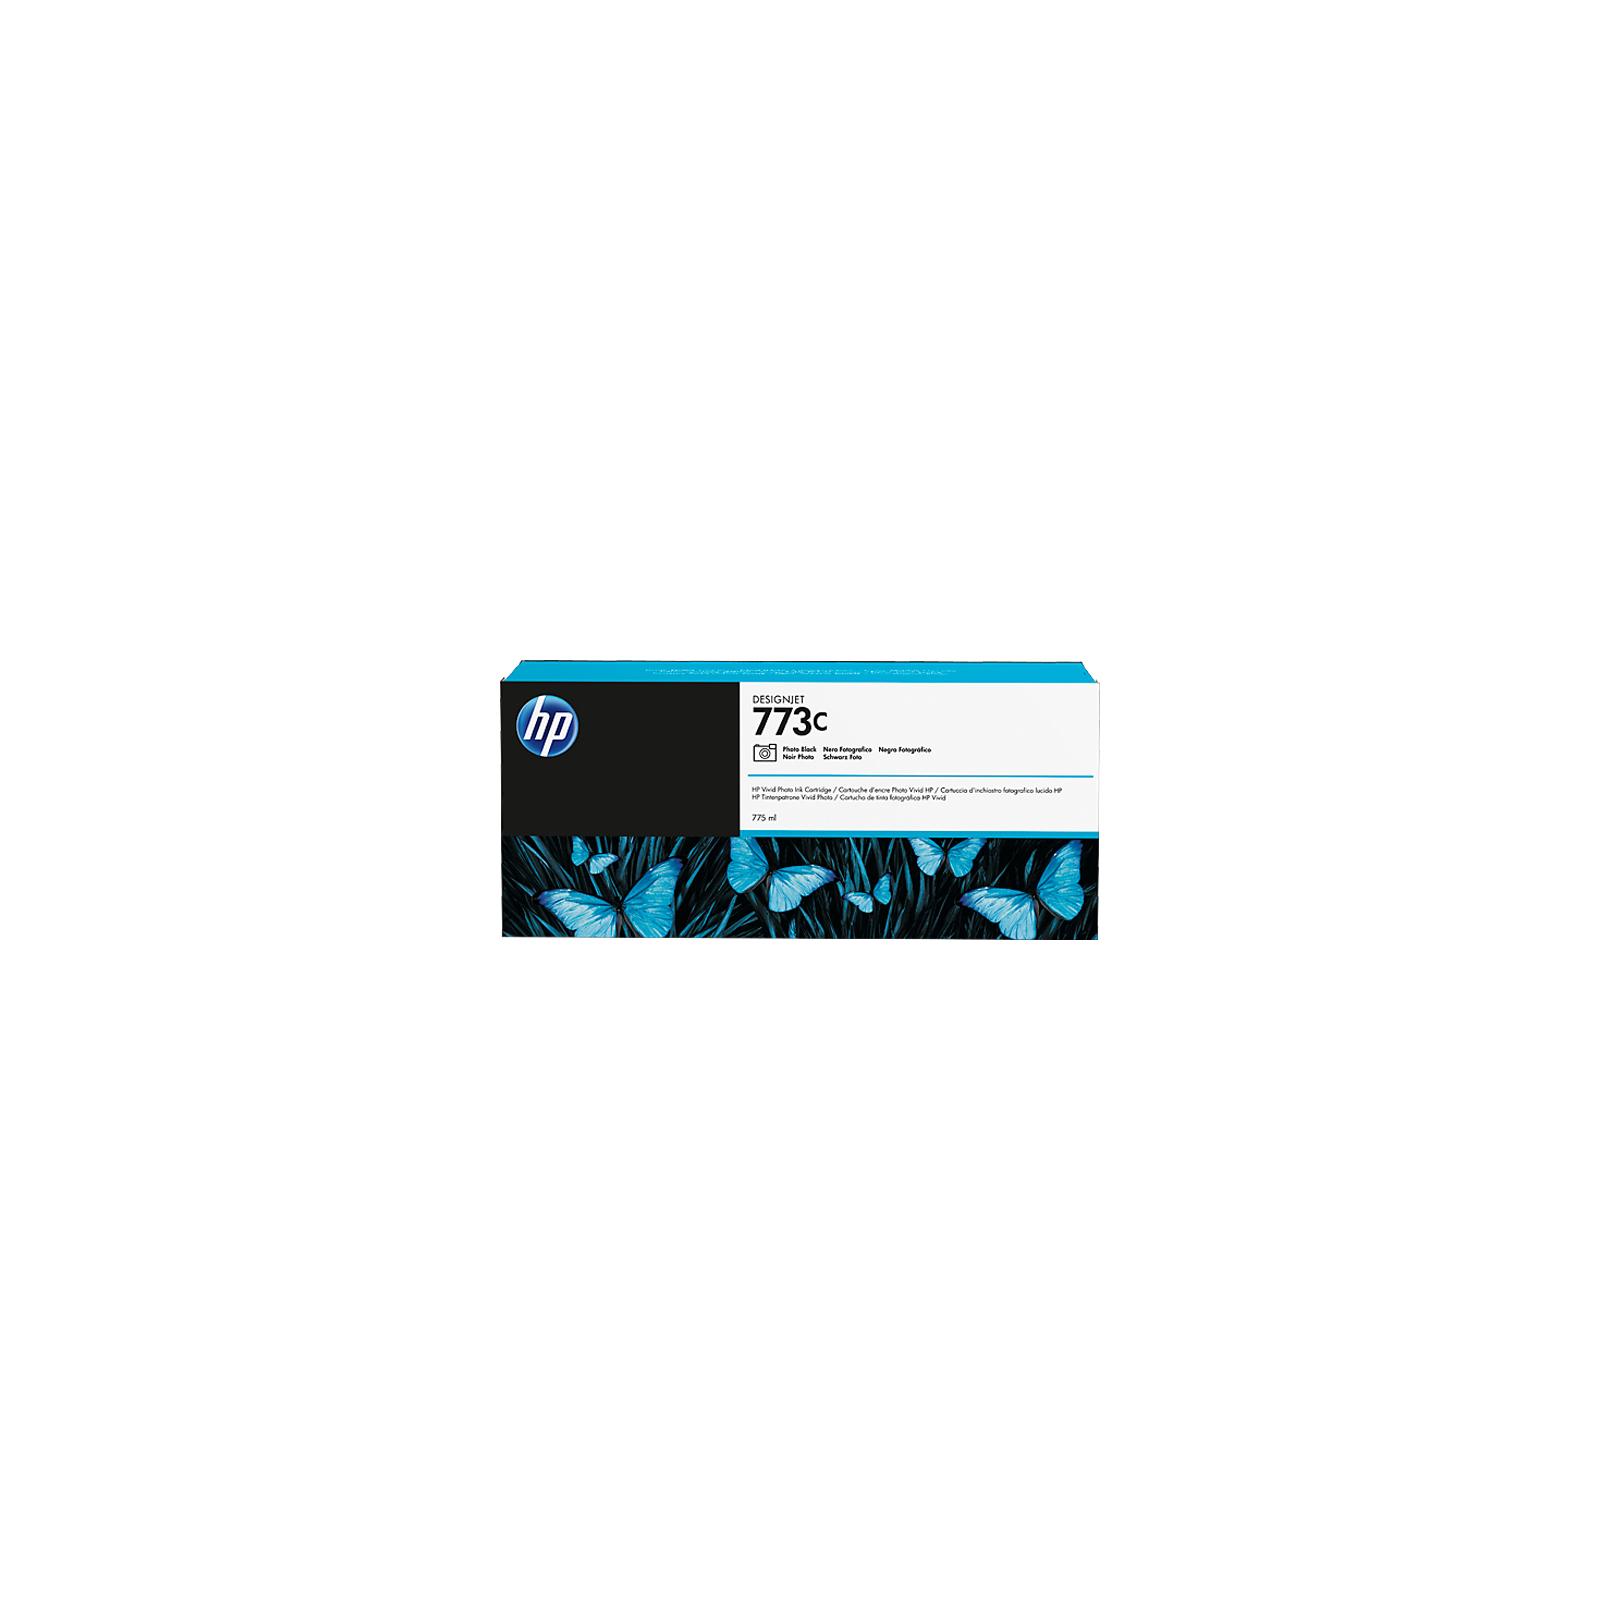 Картридж HP DJ No.773C Photo Black DesignJet Ink Cartridge (C1Q43A)